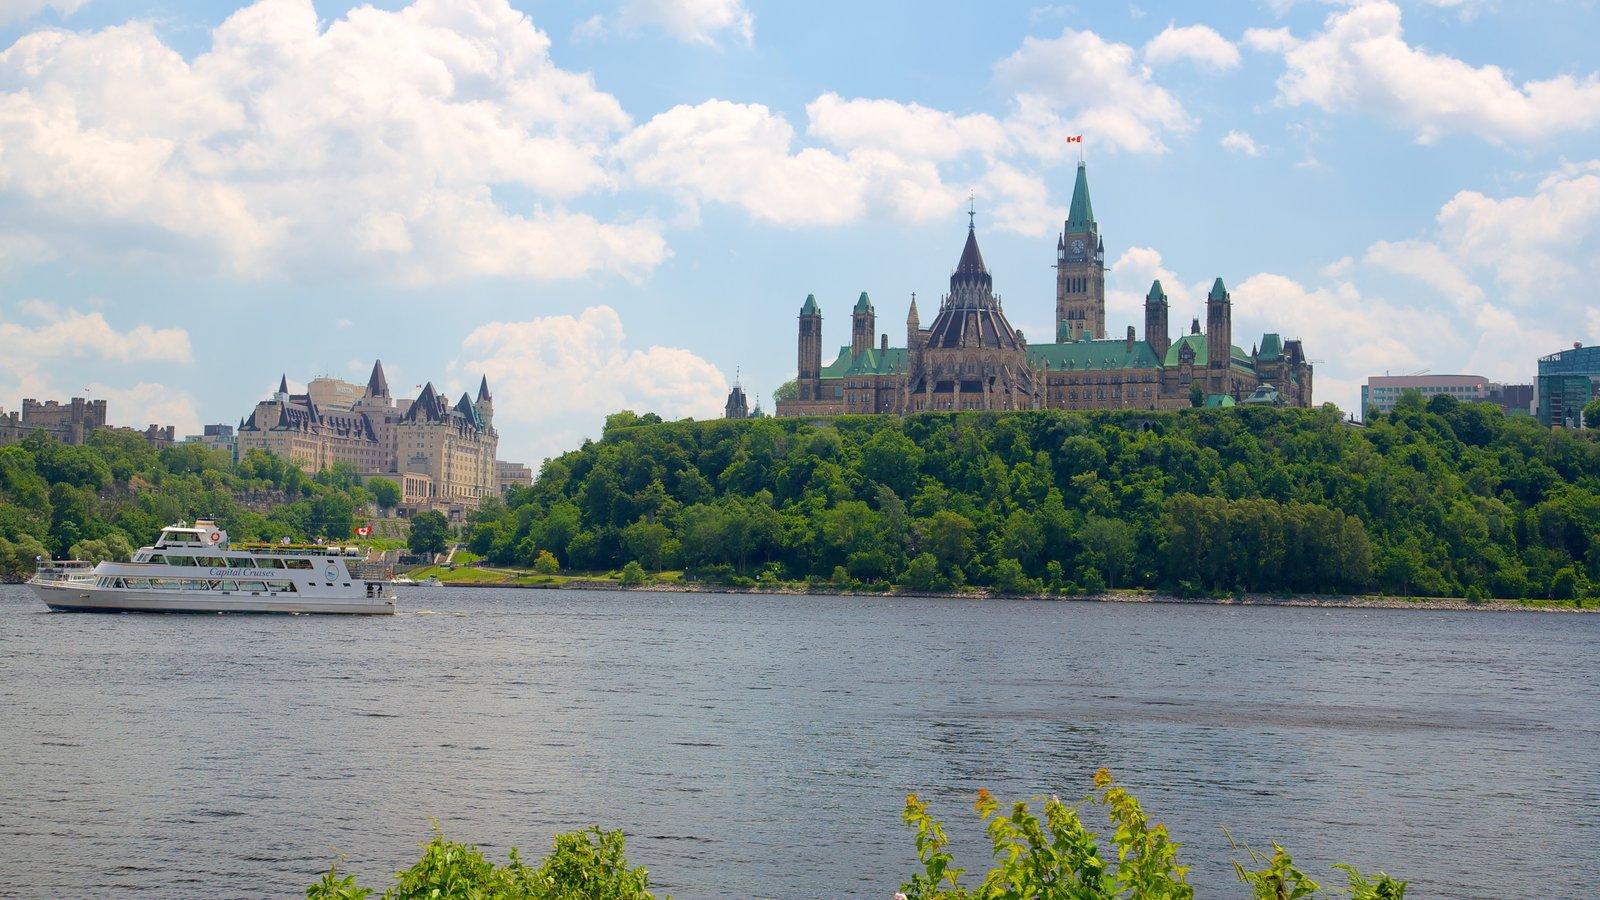 Parliament Hill que incluye un edificio administrativo, patrimonio de arquitectura y un ferry